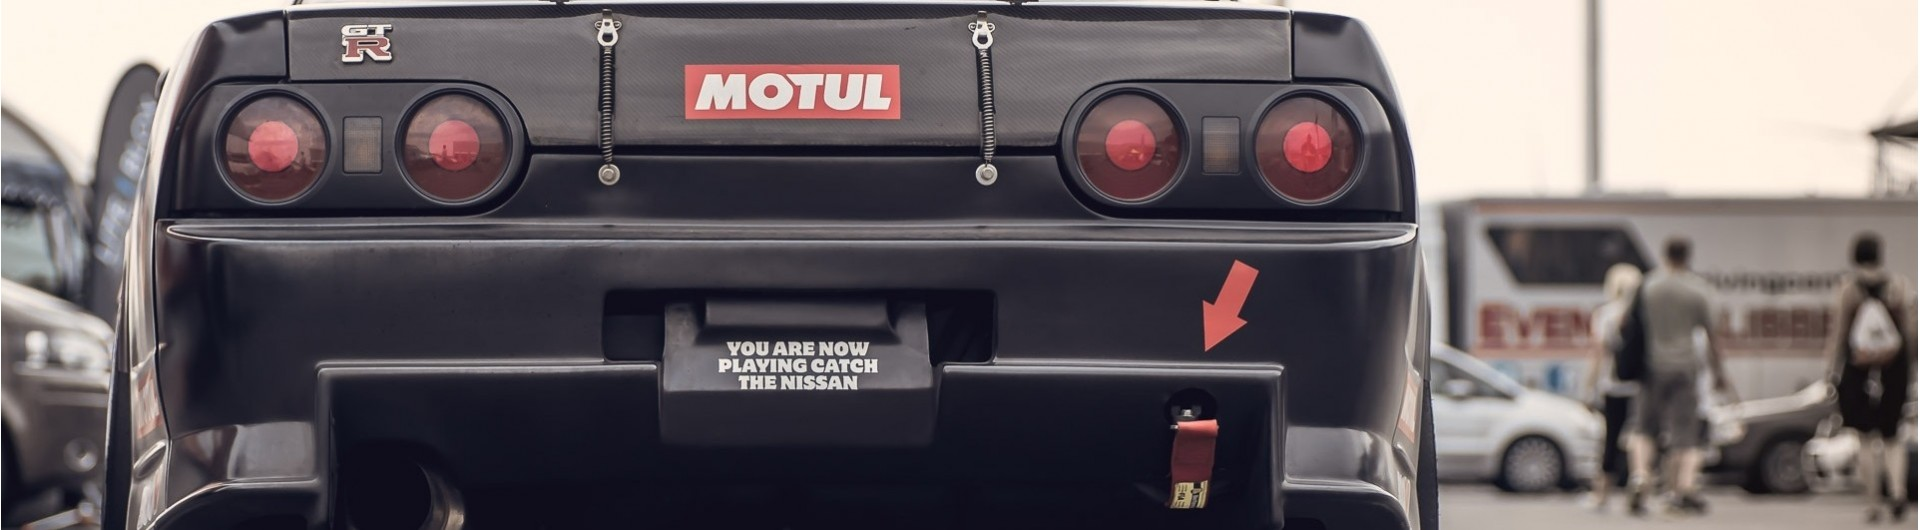 Nissan Skyline R32 BNR32 GTR GTS GTS-T GTE